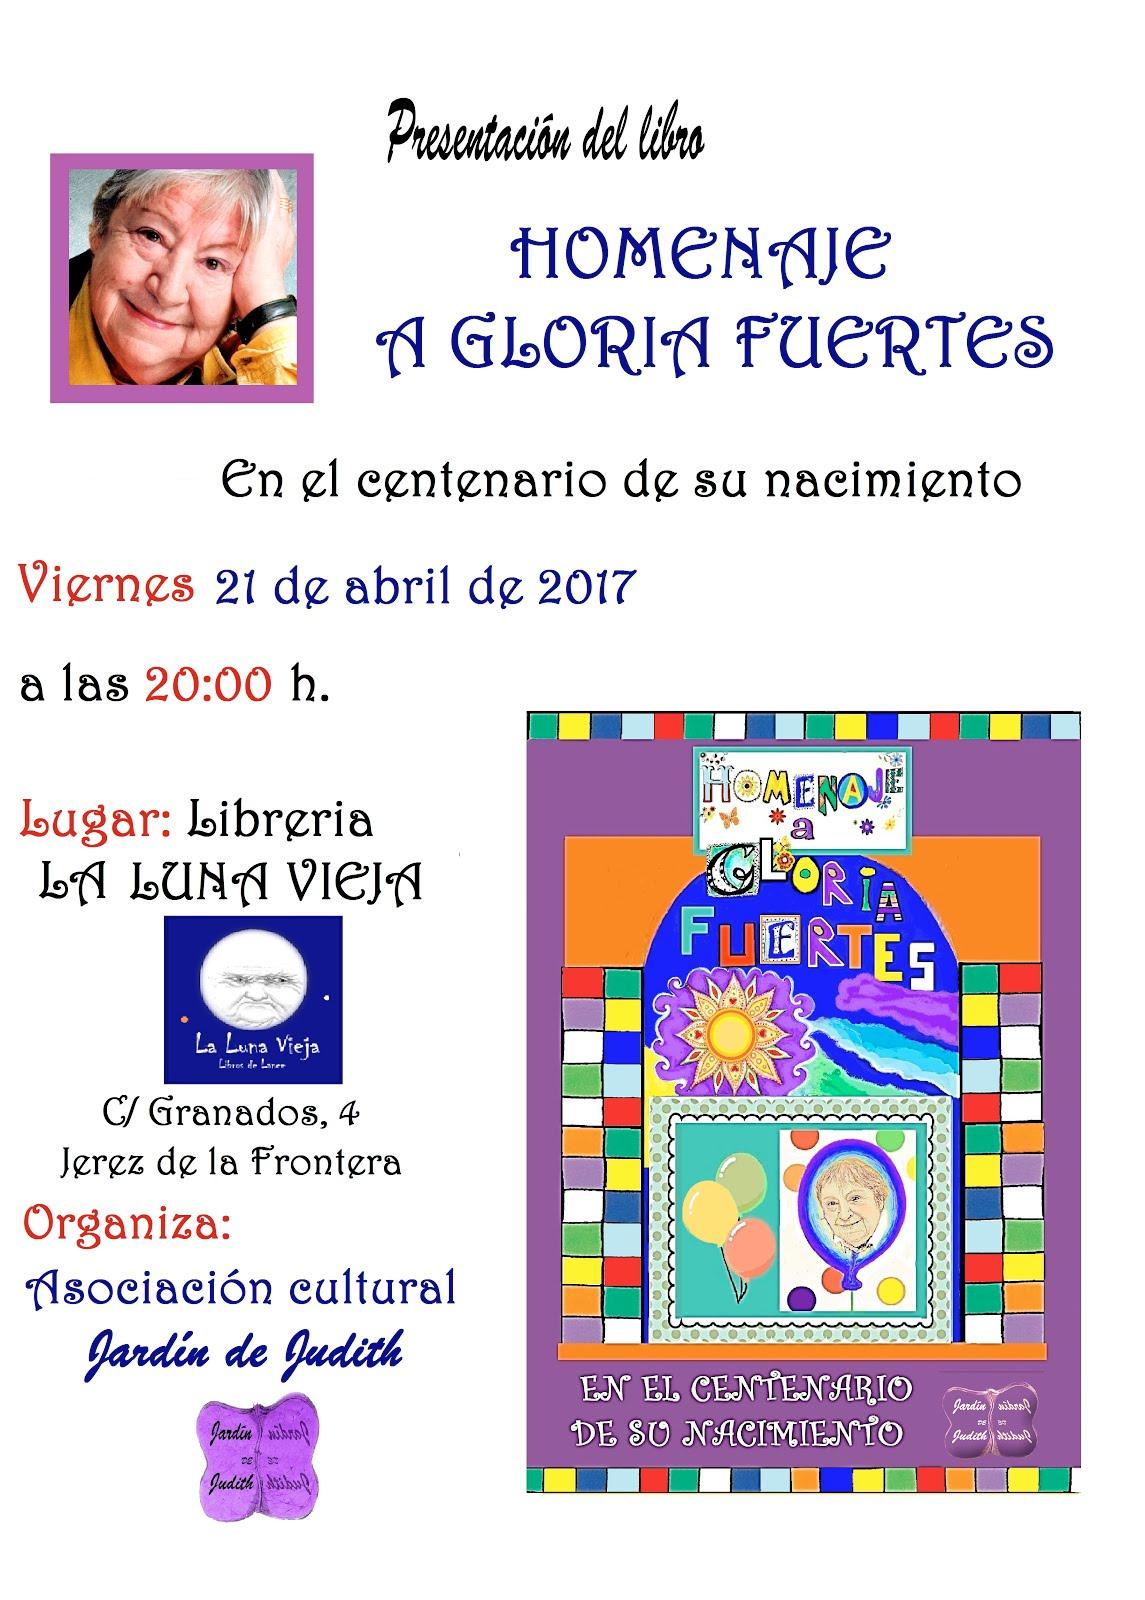 Homenaje a la gran poeta Gloria Fuertes